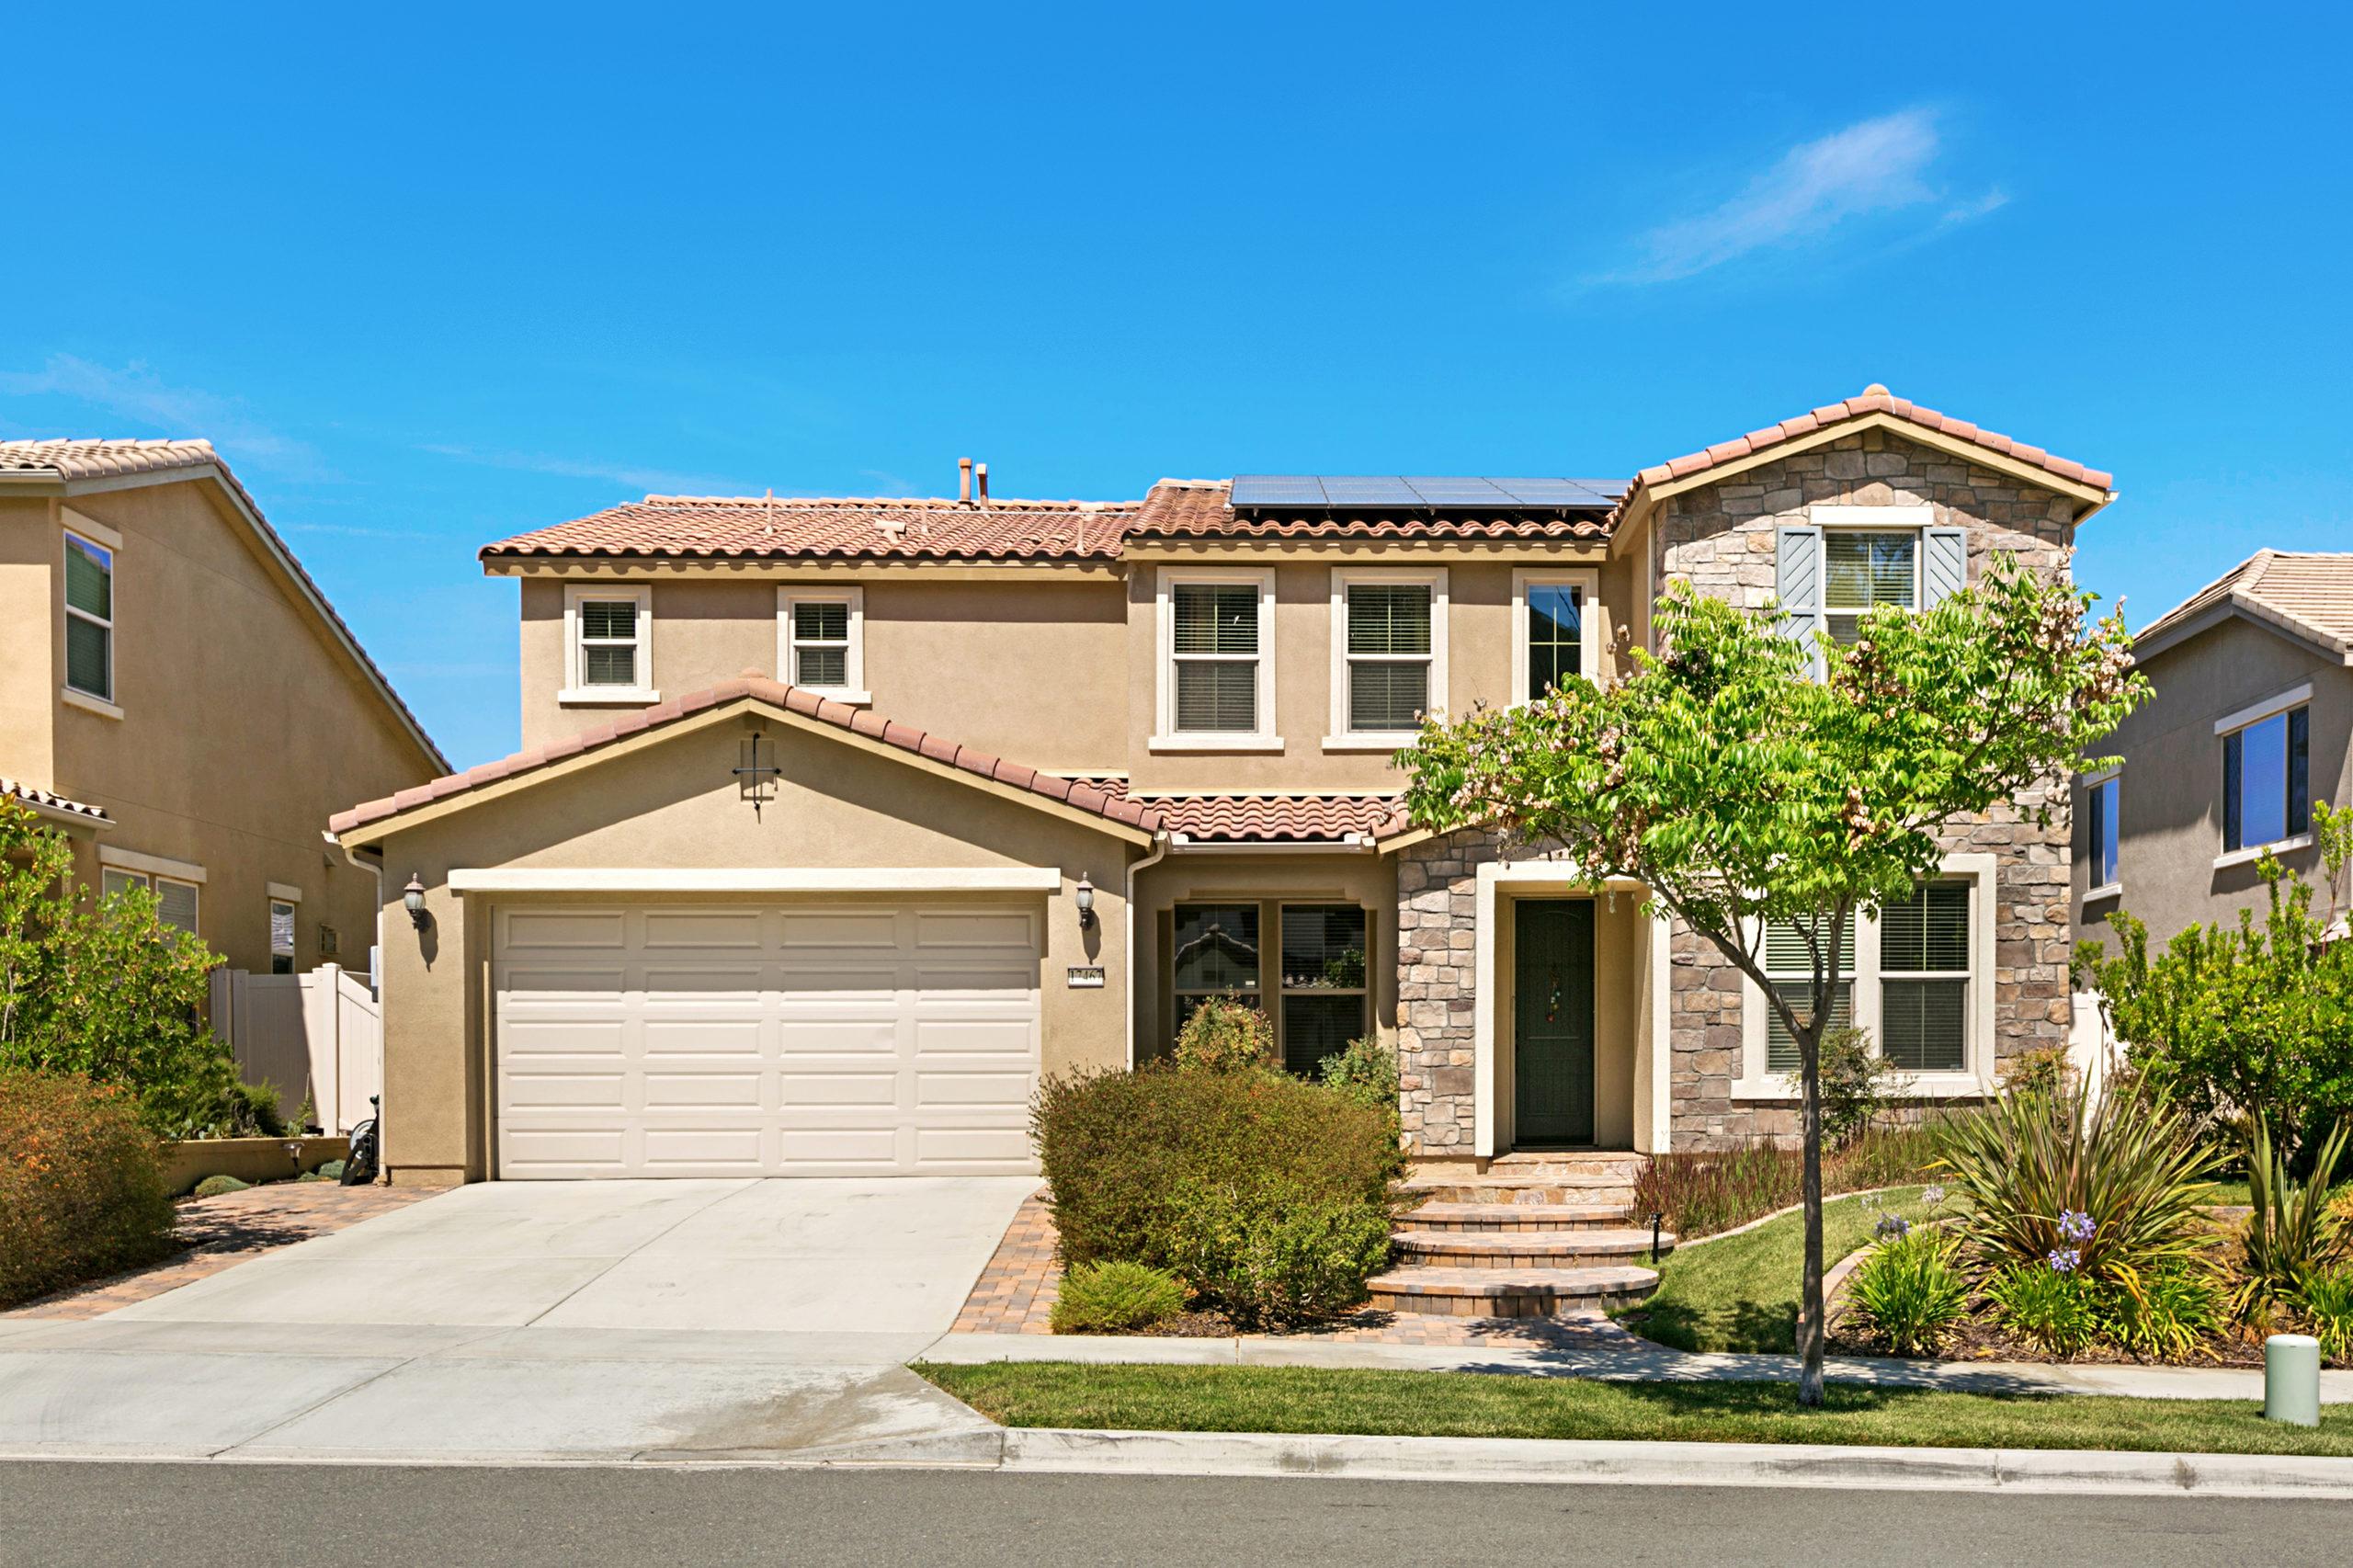 17467 Ralphs Ranch Rd, San Diego, CA 92127